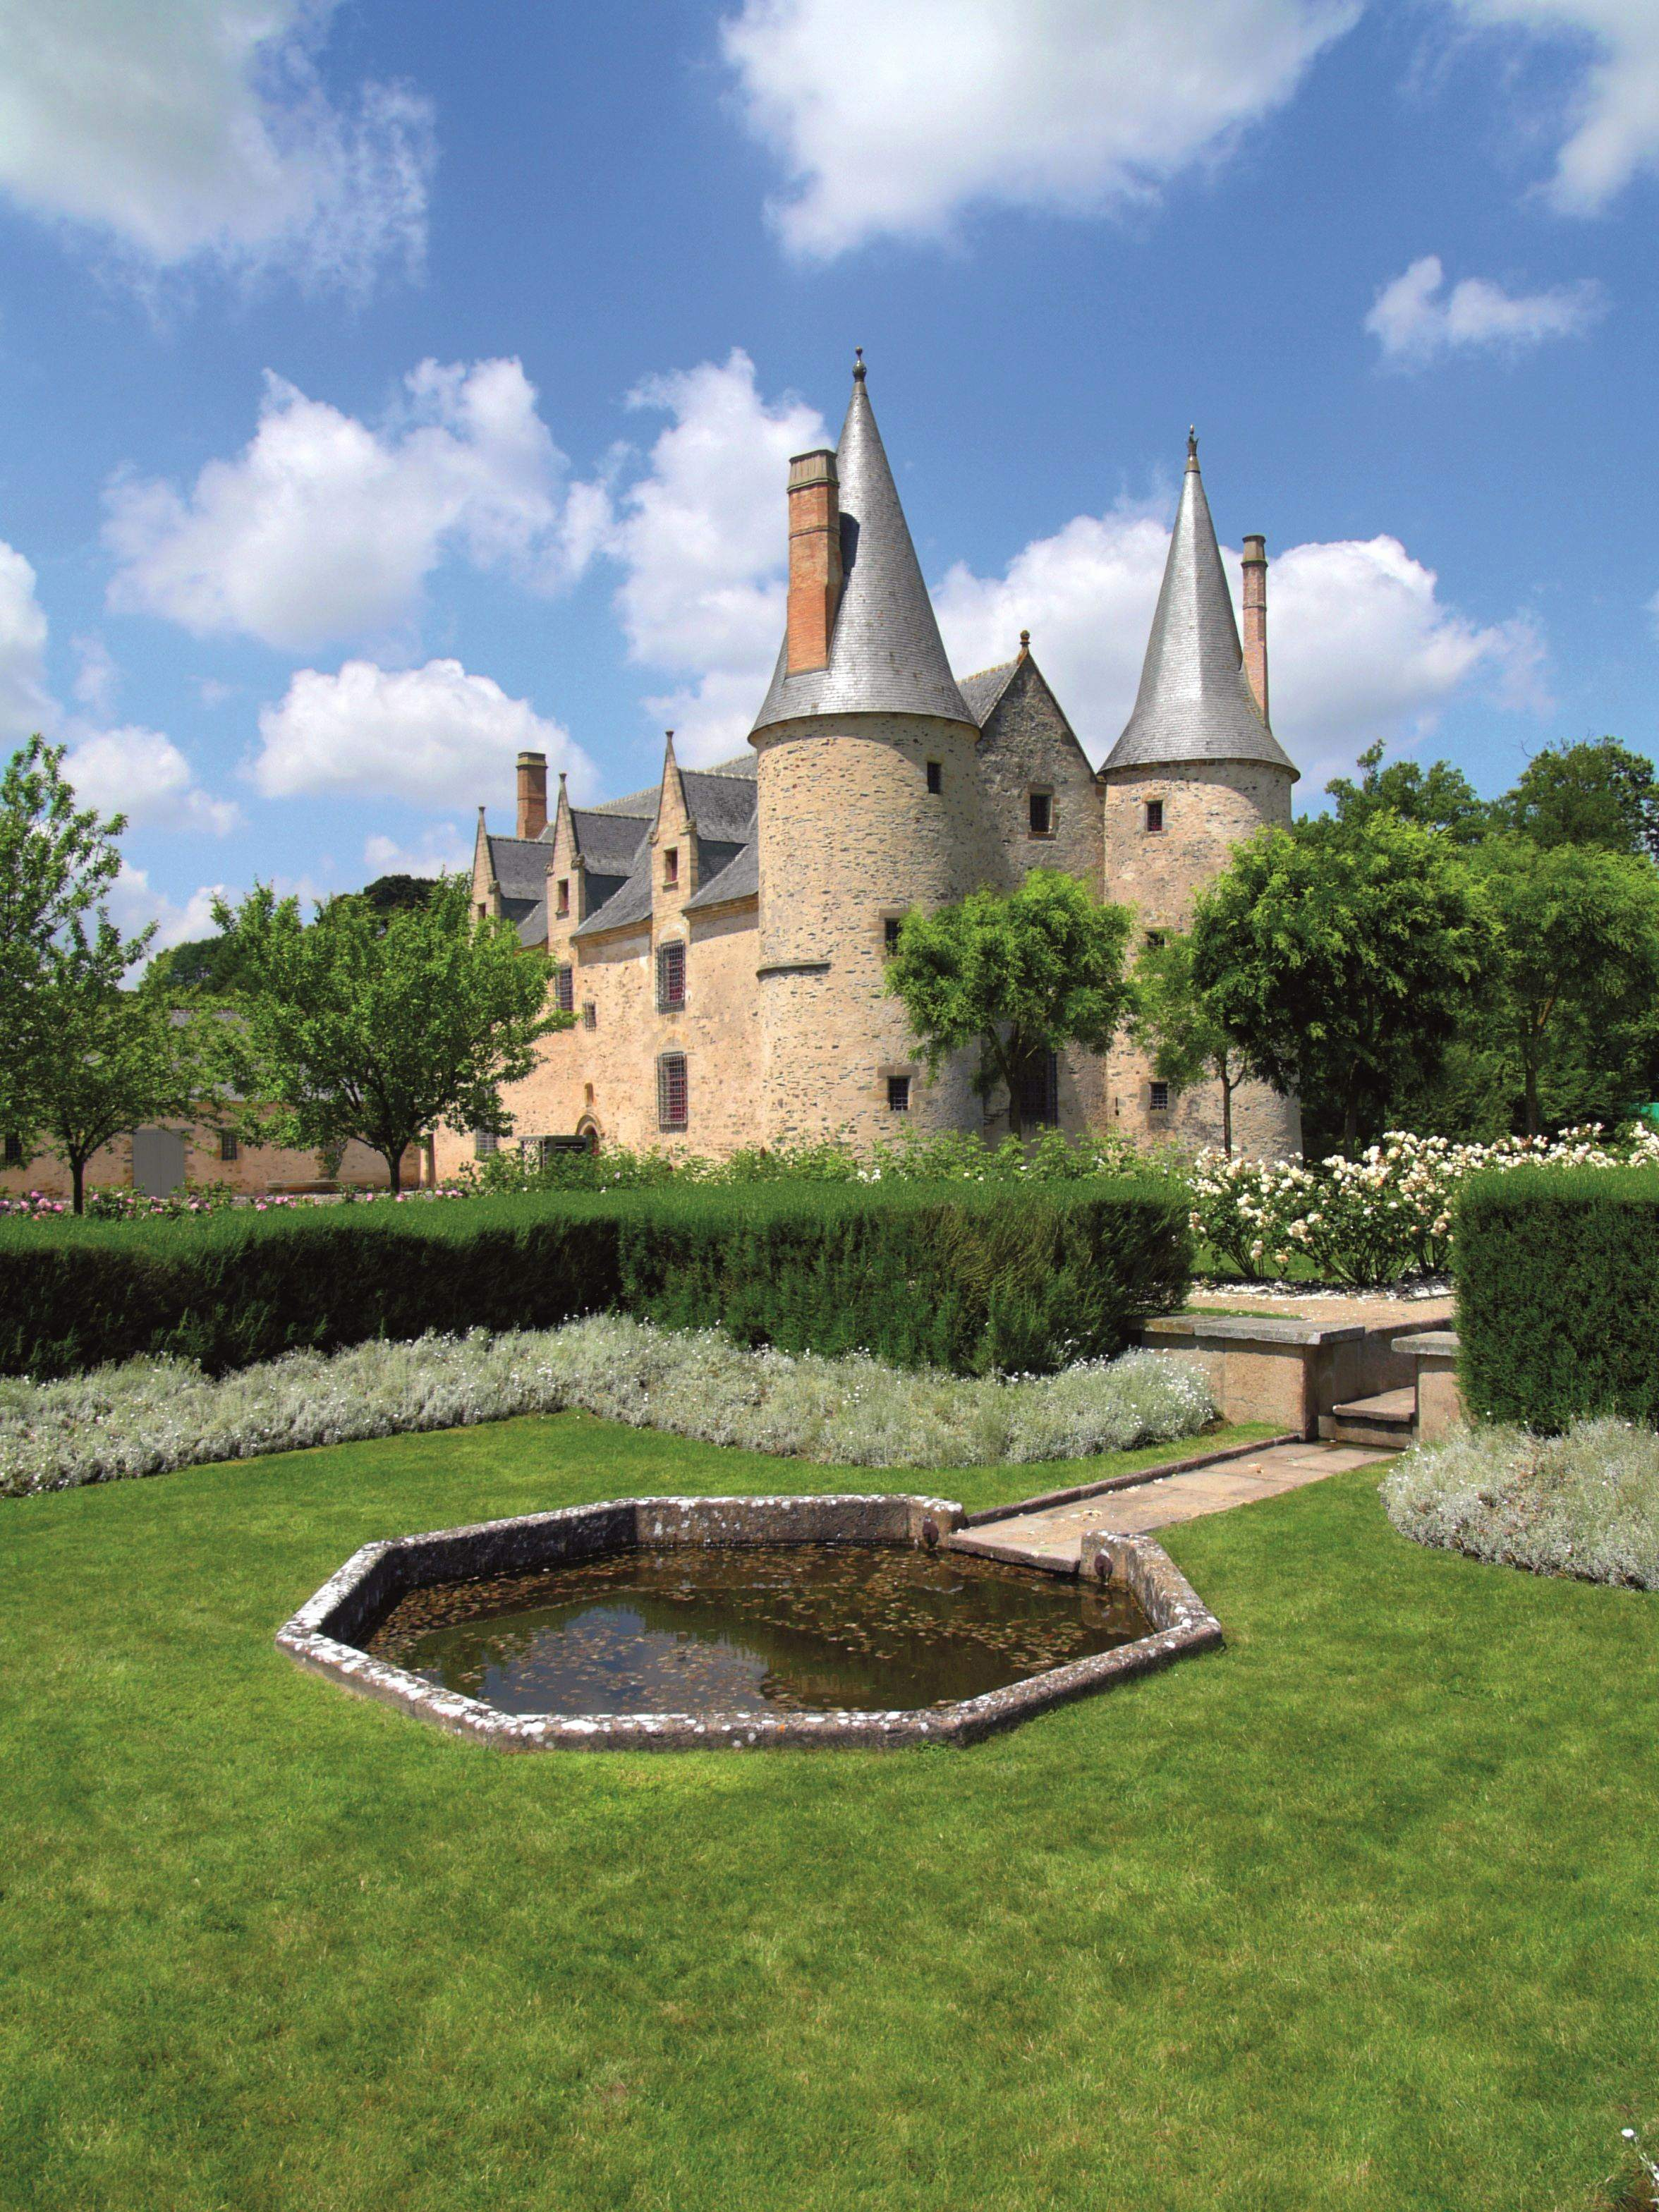 Castorama Bordure Jardin Frais Galerie Pic Vert Jardin Gracieux Castorama Bordure Jardin Cuisine Et